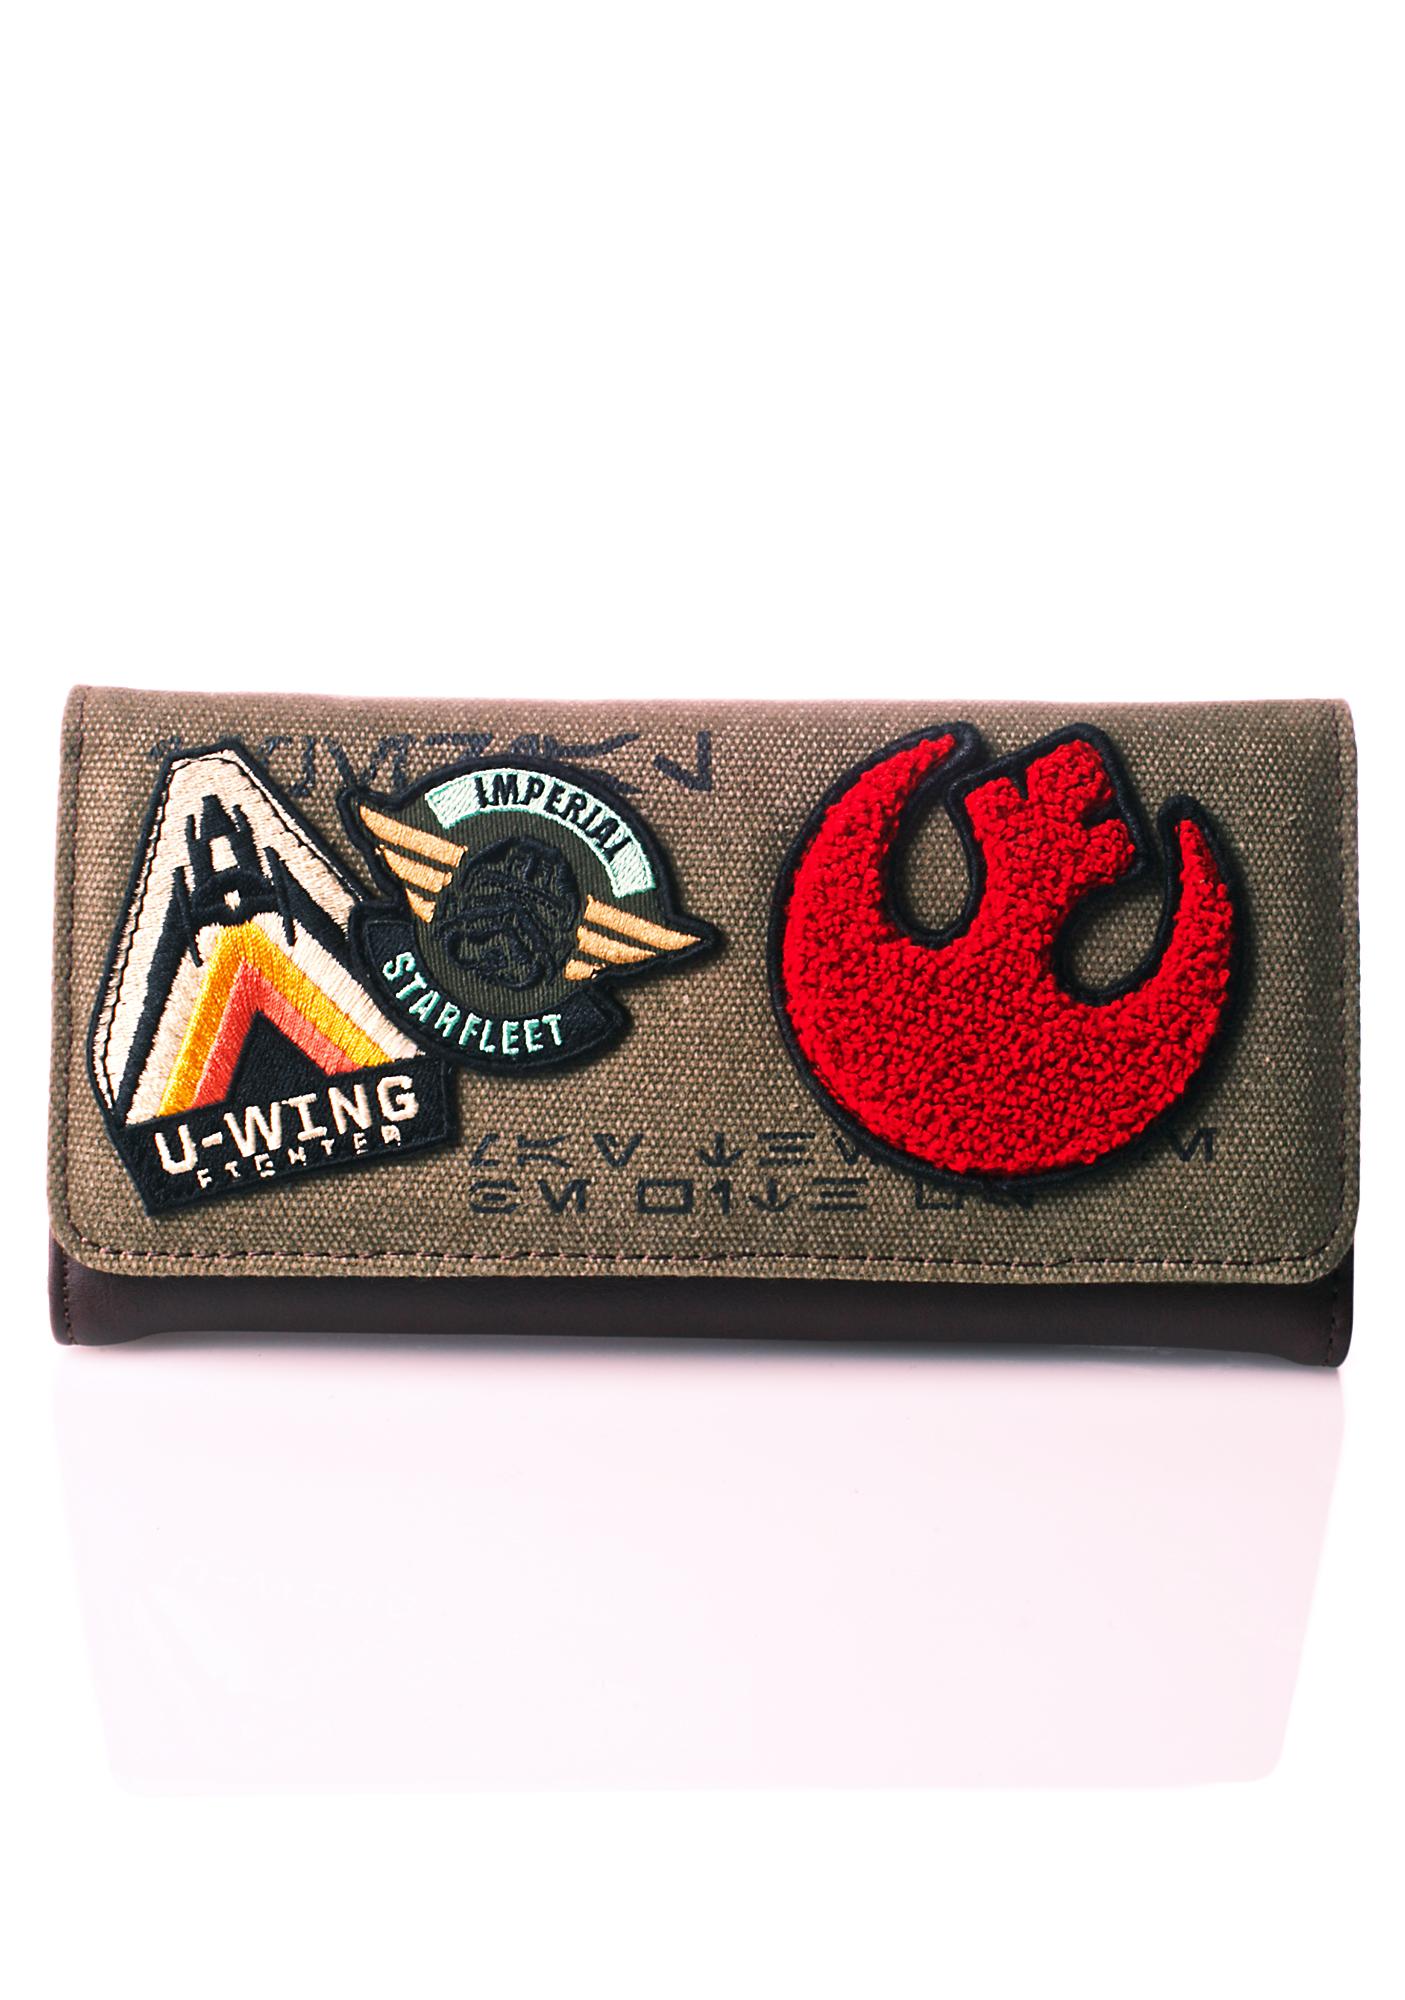 Loungefly Rebel Alliance Wallet